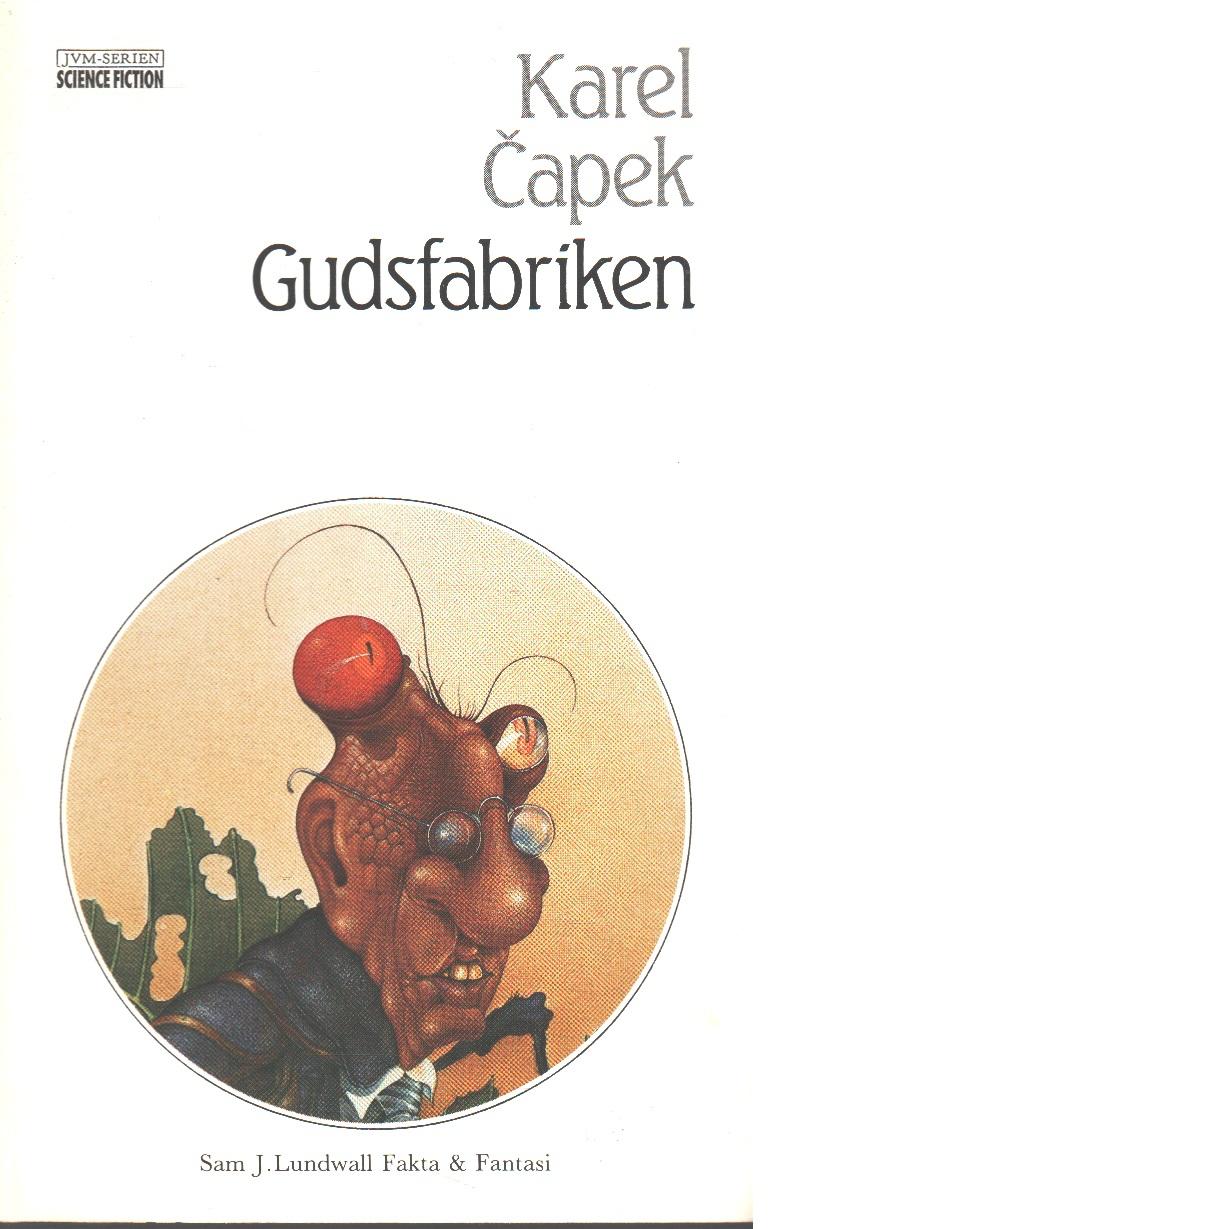 Gudsfabriken  - Čapek, Karel